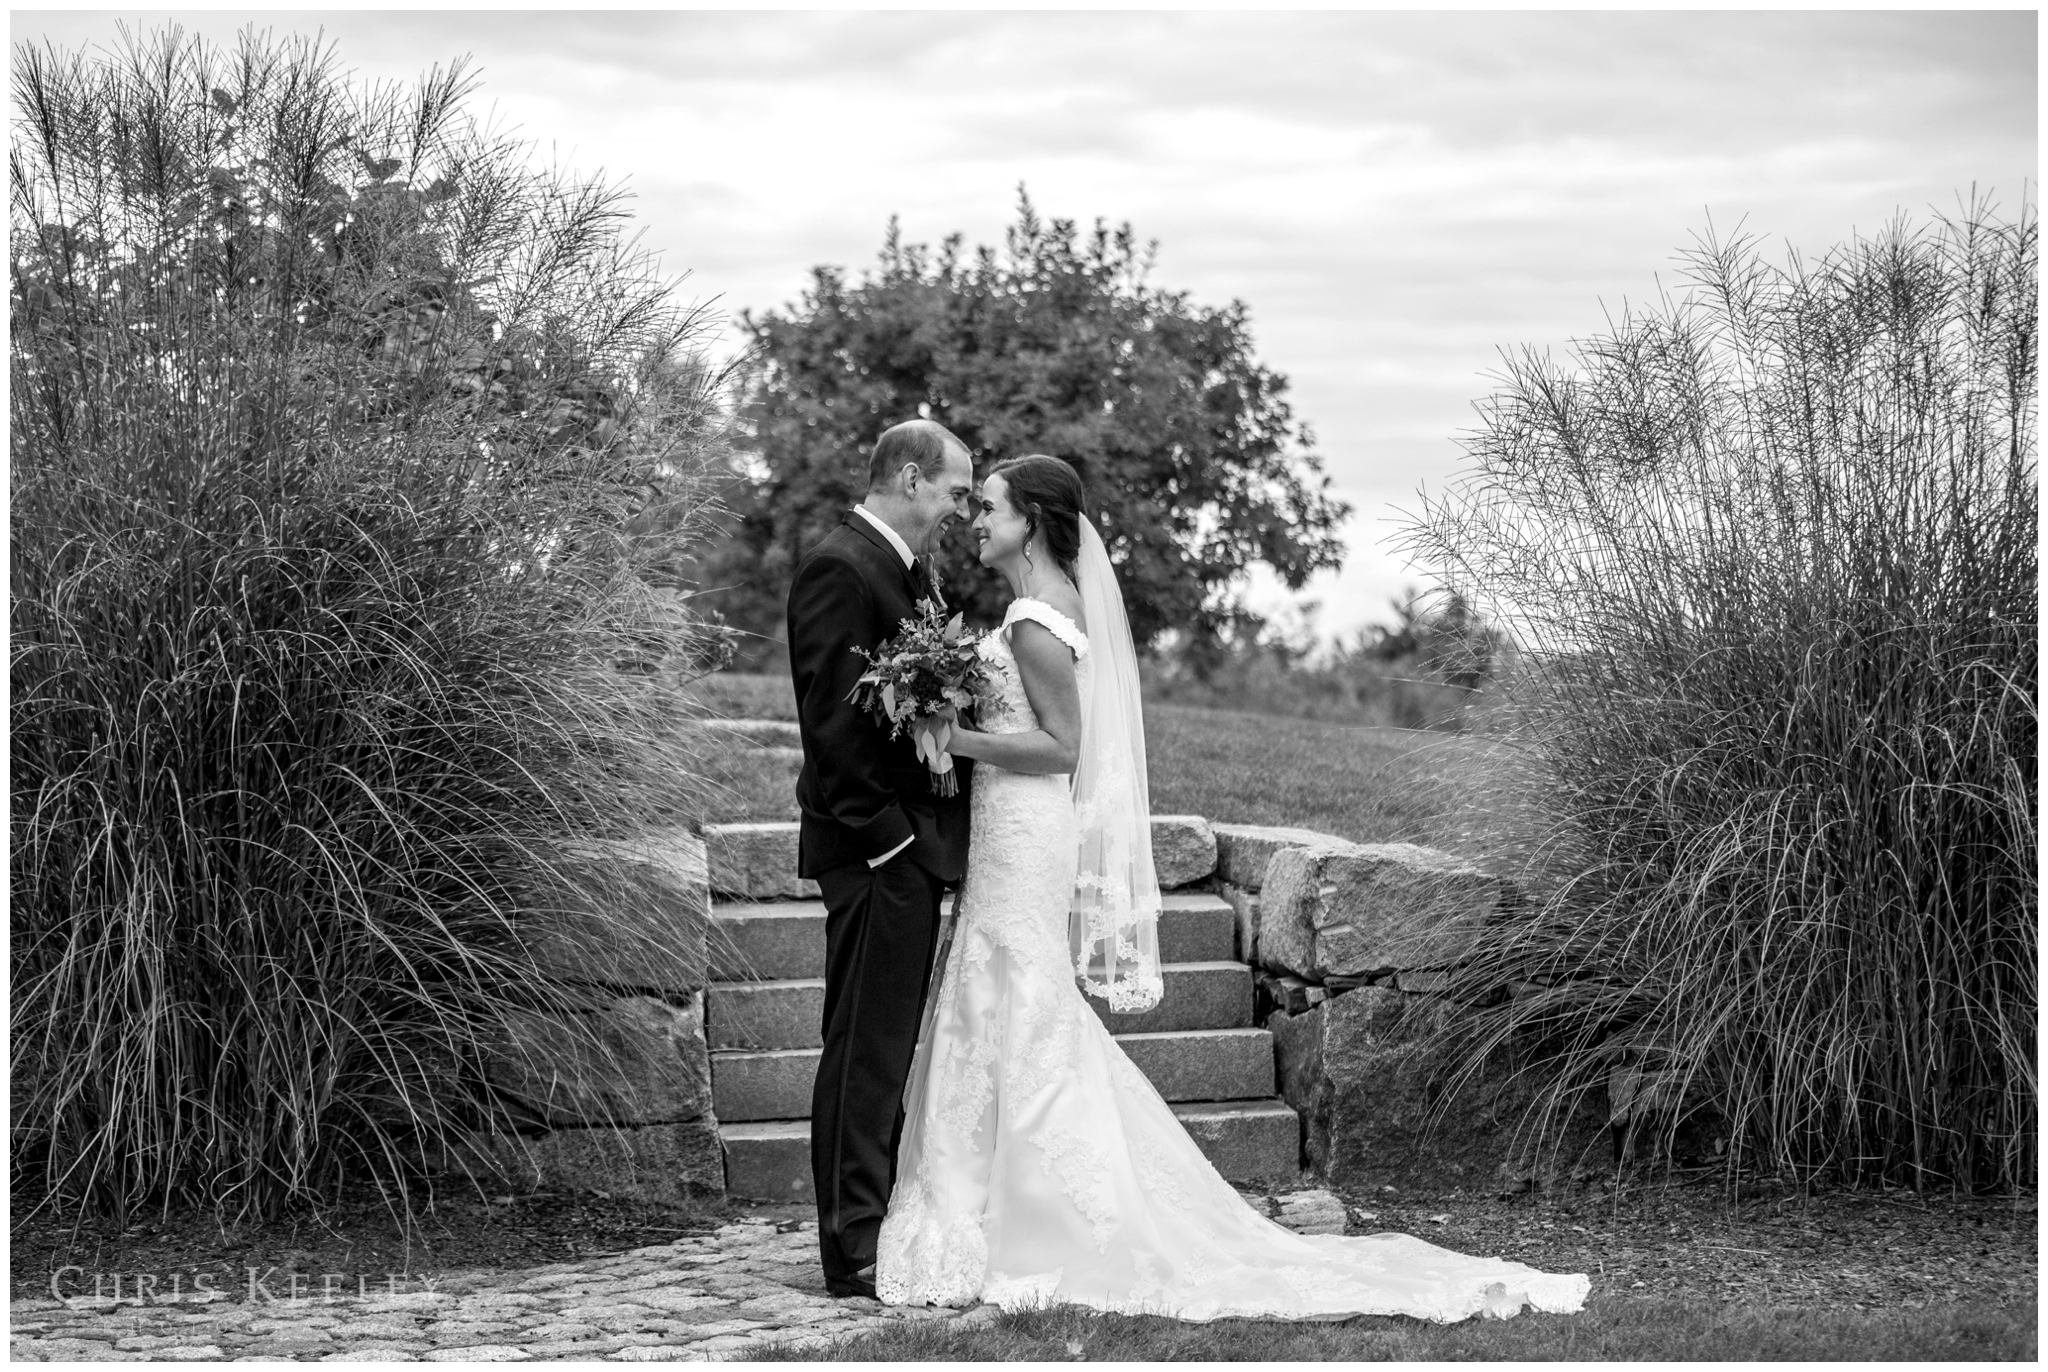 22-birch-hill-farm-new-hampshire-wedding-photographer-chris-keeley-photography.jpg